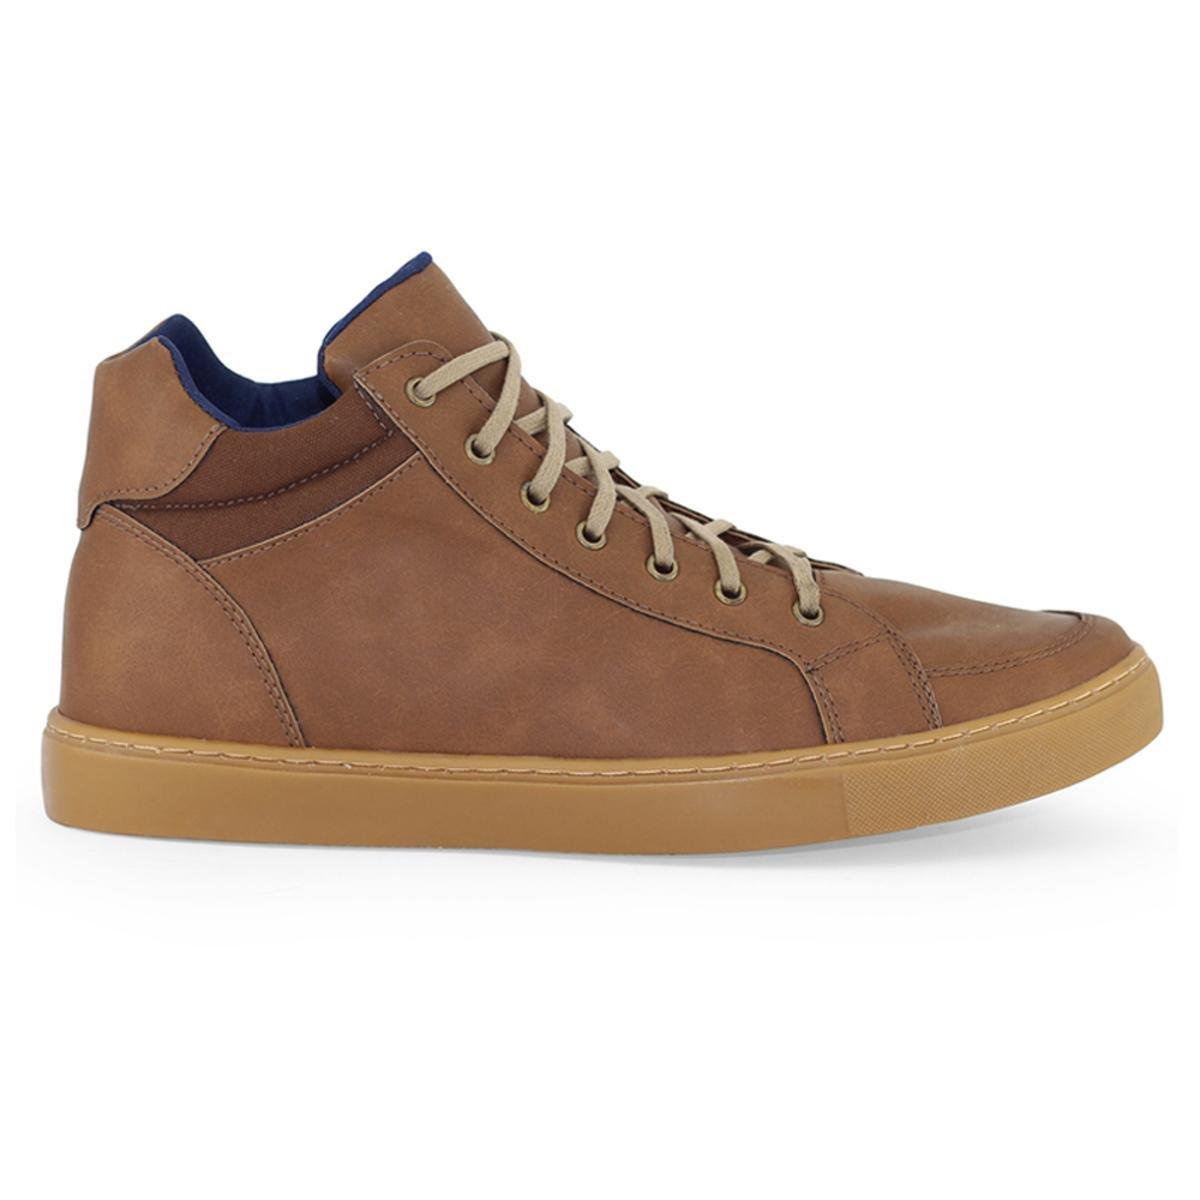 Sapato Sapato Meu Masculino Garage Bota Caramelo Bota Meu Sapato Bota Garage Masculino Meu Garage Caramelo dq0nCgw